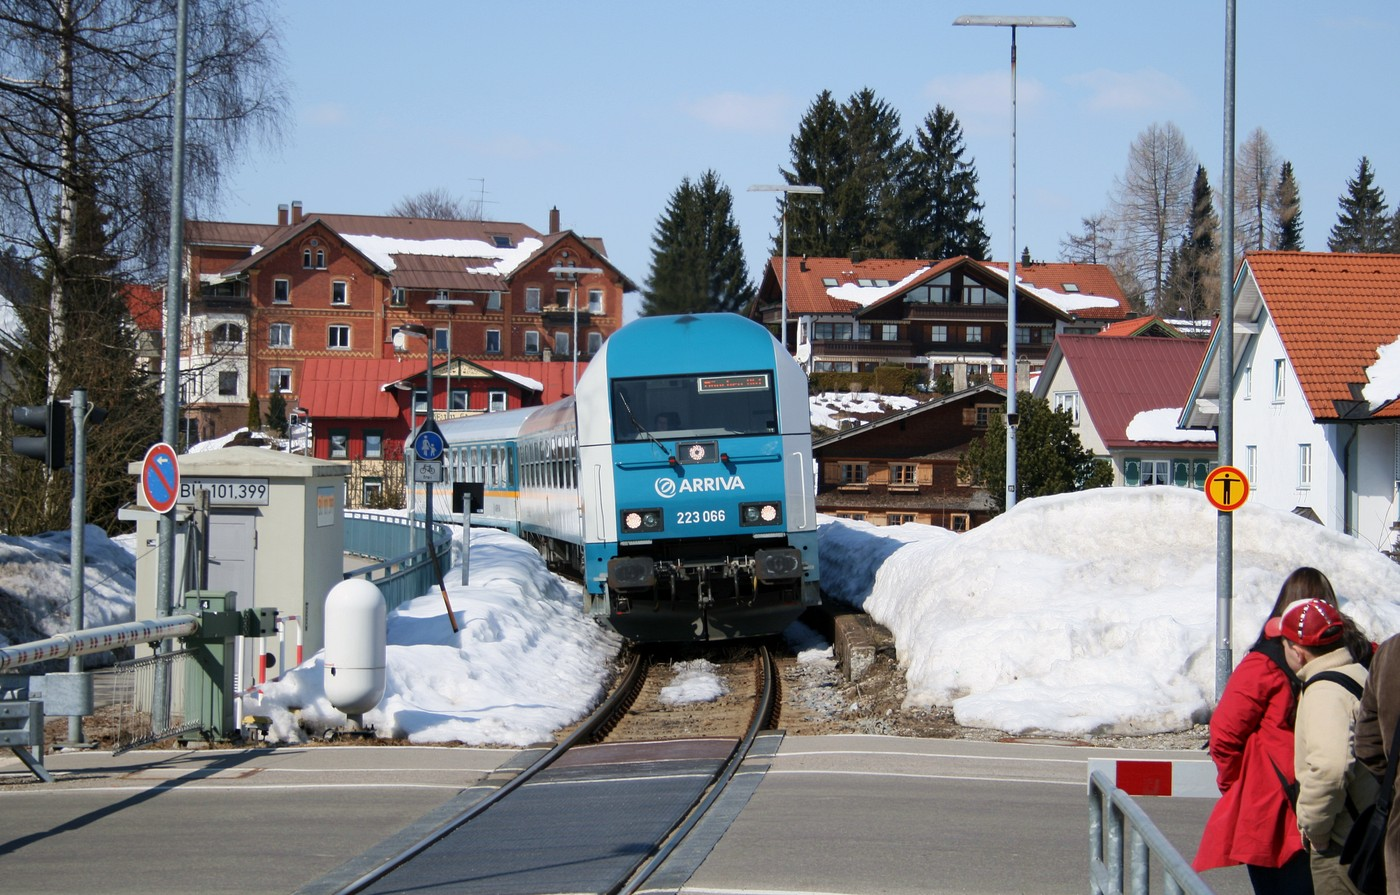 http://www.eisenbahn-im-bild.de/Temp/D_09_Oberstau_IMG_2695.jpg